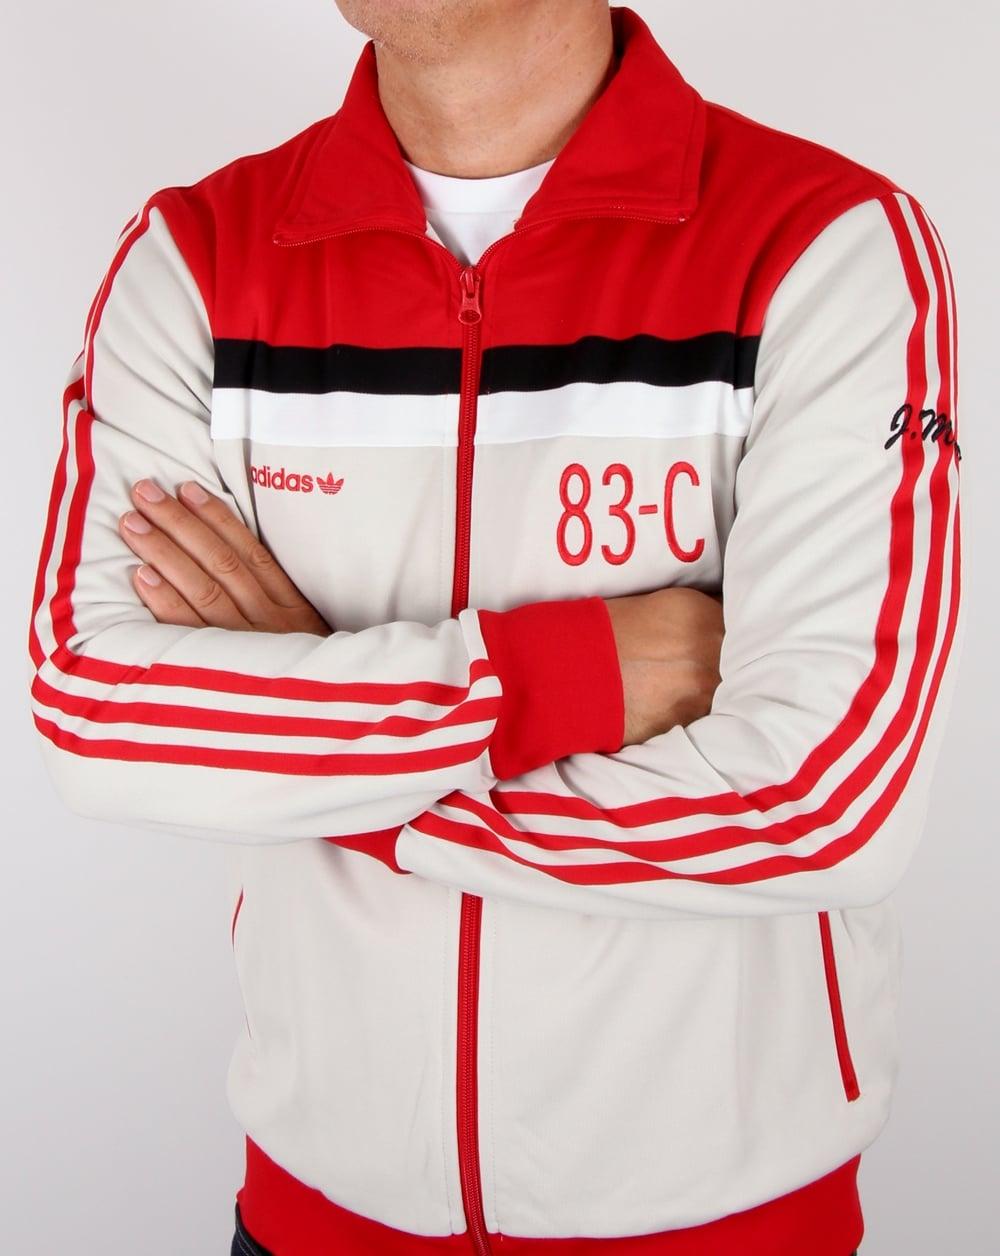 adidas 83 c. adidas originals 83-c track top talc/red 83 c o